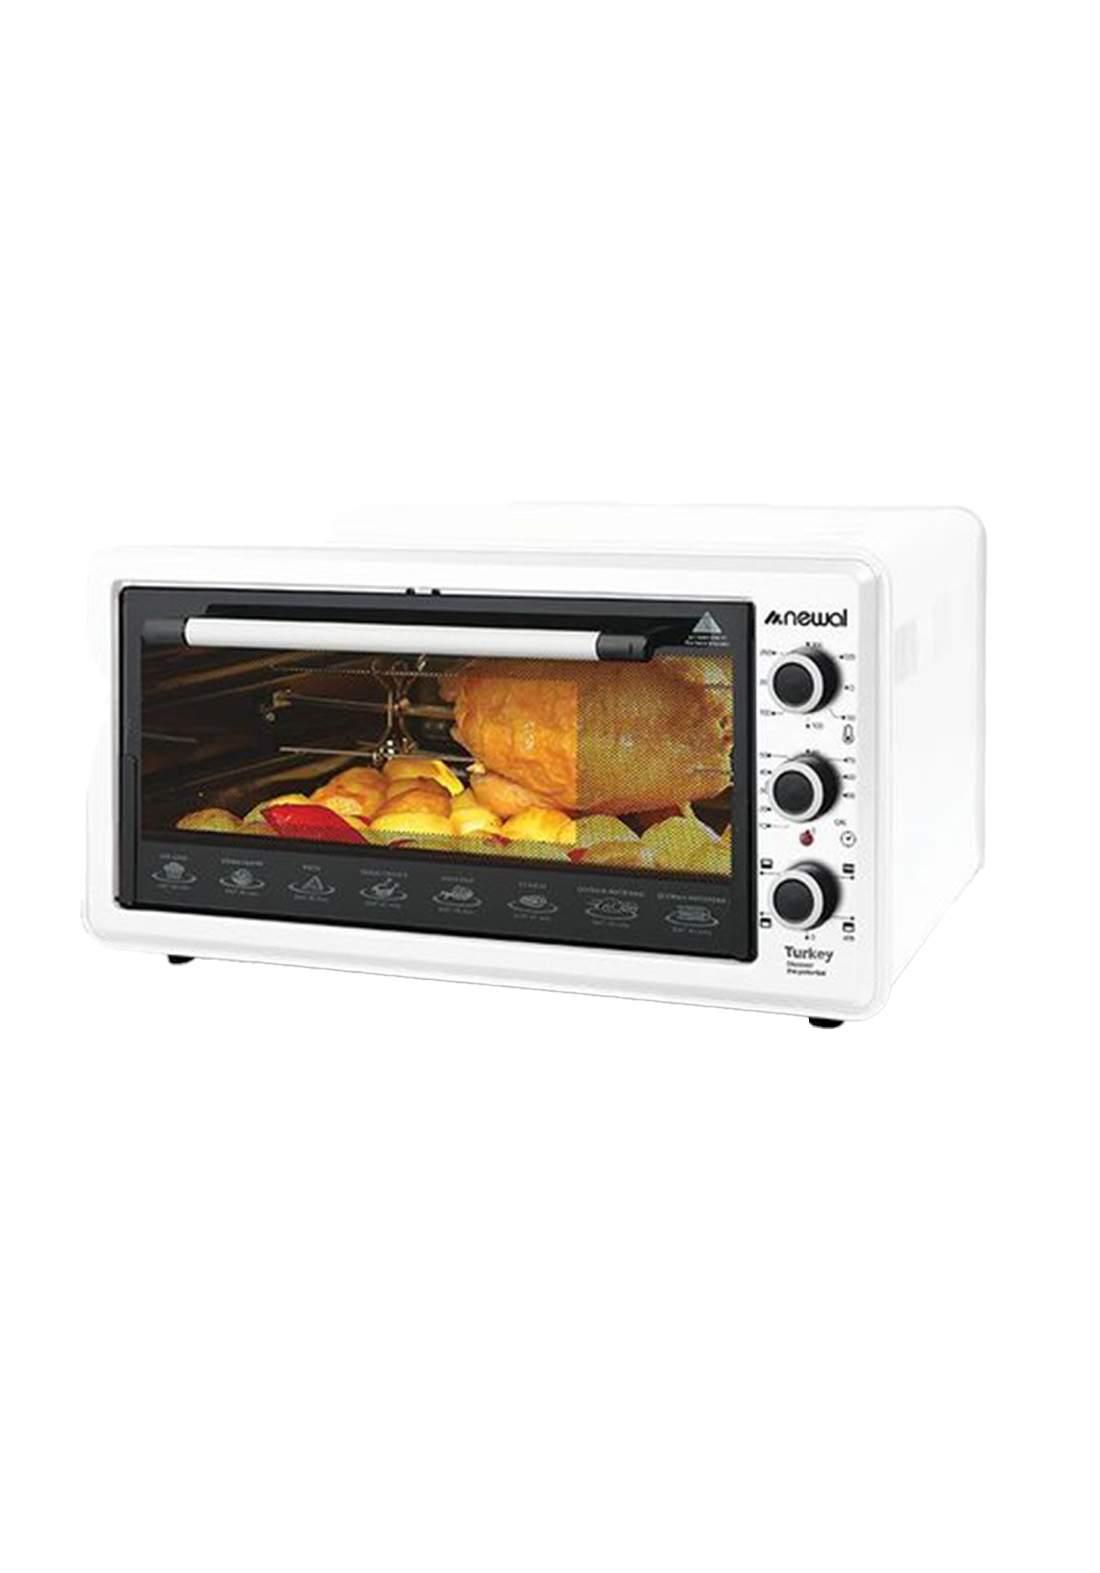 Newal Mini Oven 45L MOV-456-01 - White فرن كهربائي